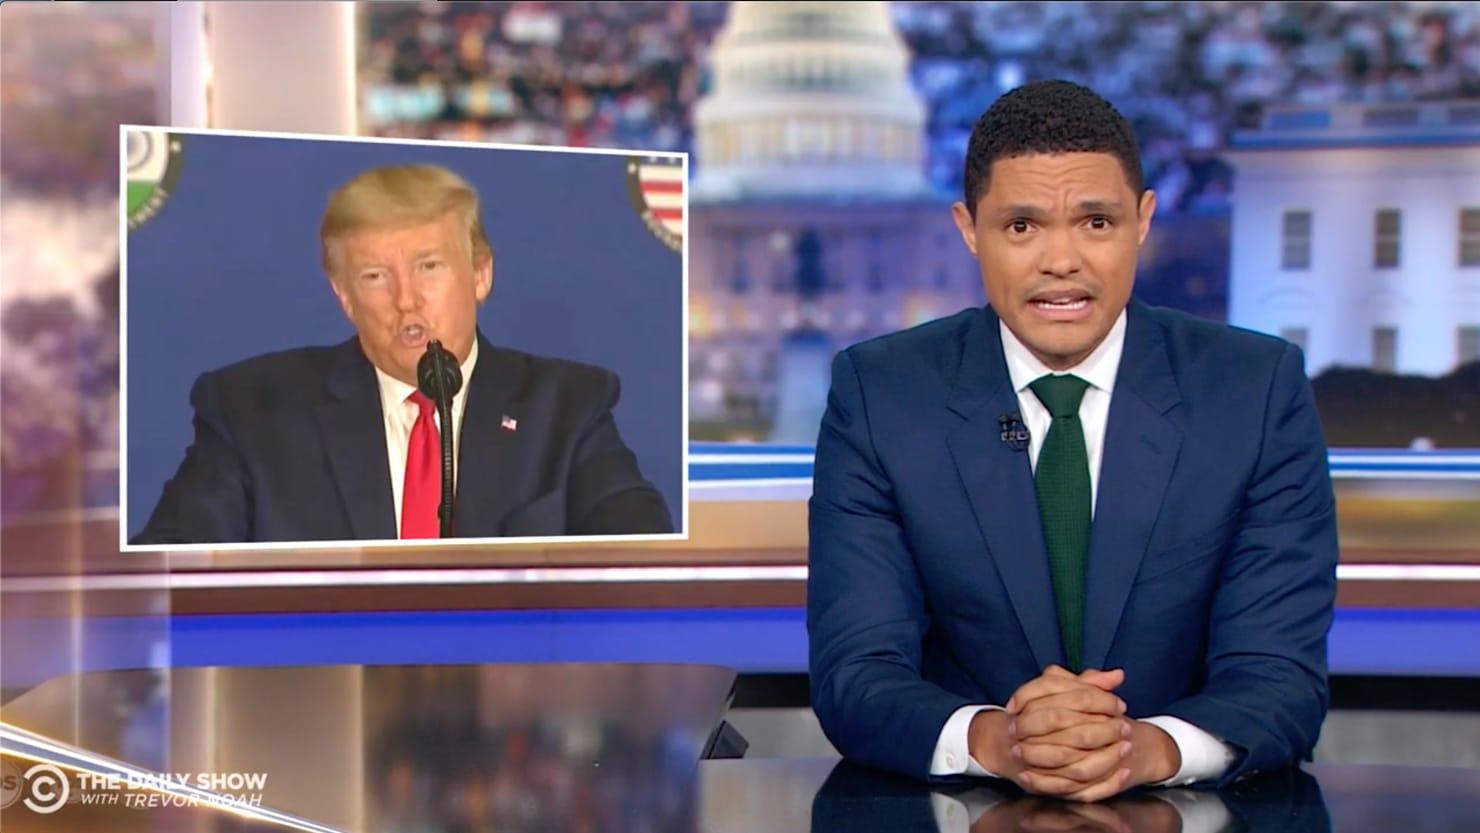 Trevor Noah Terrified by Trump's Coronavirus Response: 'We're Definitely All Going to Die'